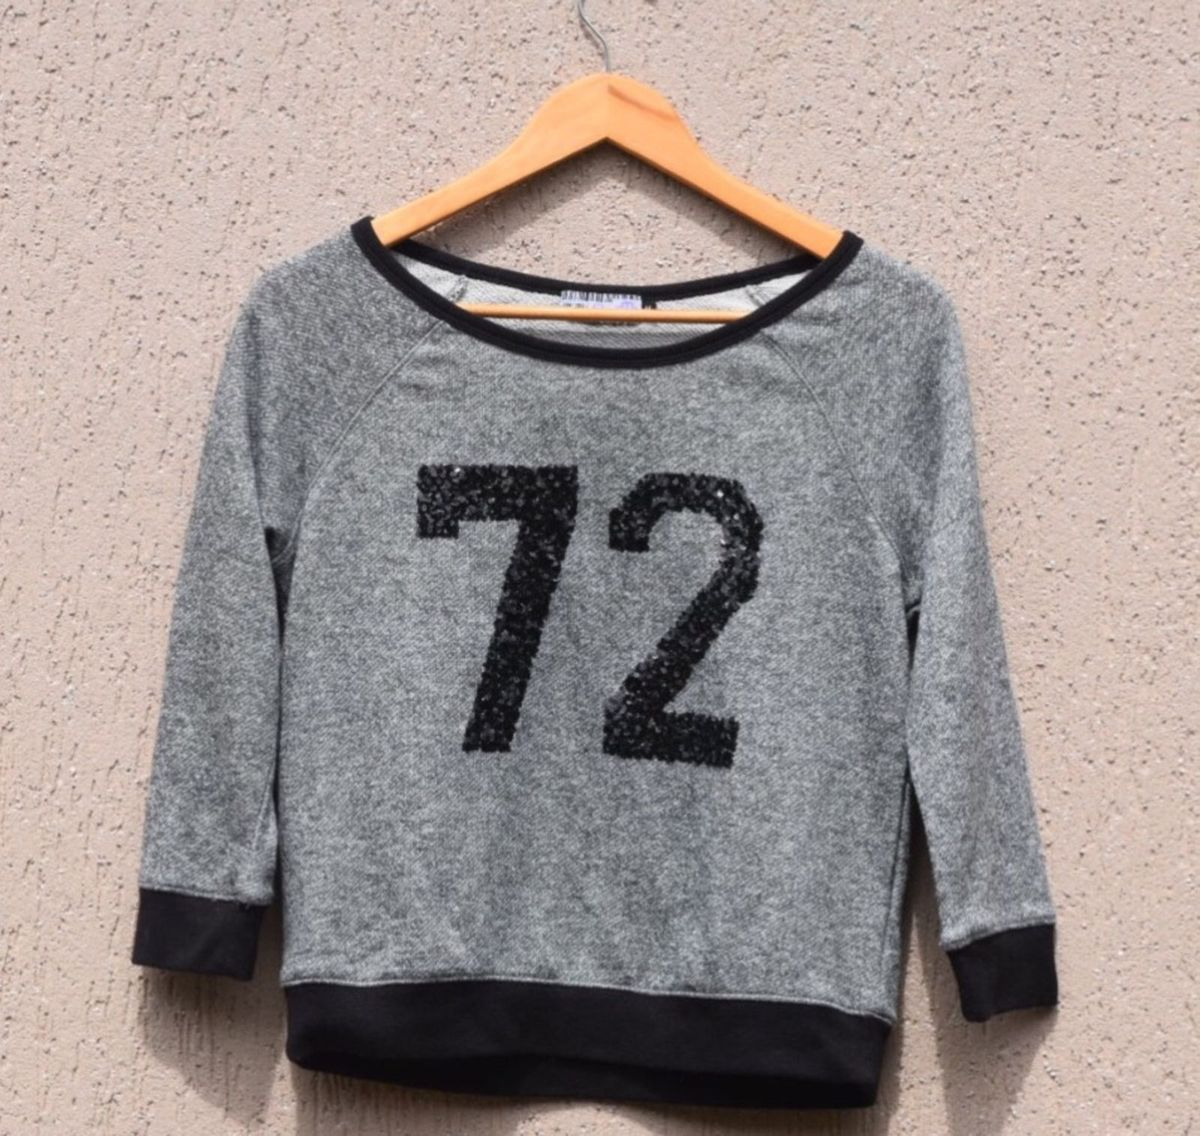 401ab1e01f blusa de frio curta - blusas emme.  Czm6ly9wag90b3muzw5qb2vplmnvbs5ici9wcm9kdwn0cy83ntuxmtiwlzc4y2y2ztzmnzyxndniymm4nwq2yzy0mzizowu1ndeylmpwzw